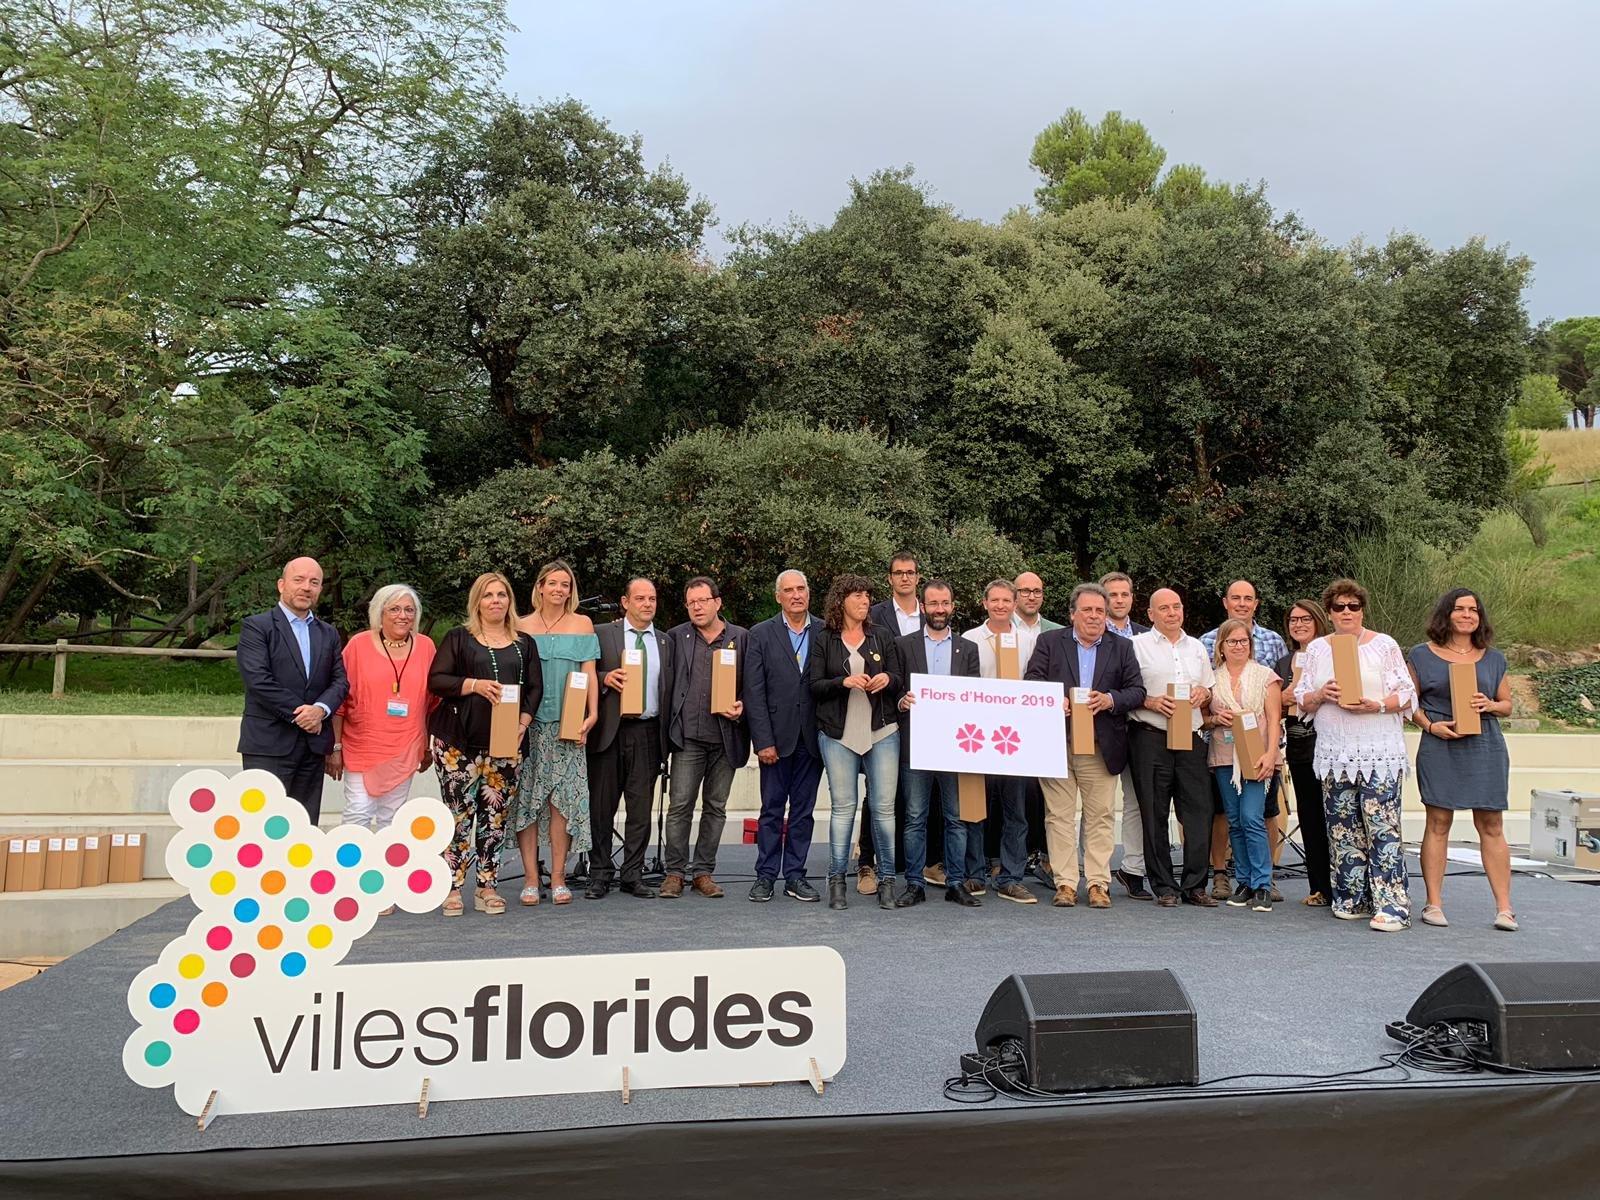 Taradell - Viles Florides Flors d'Honor 2019 - Mercè Cabanas